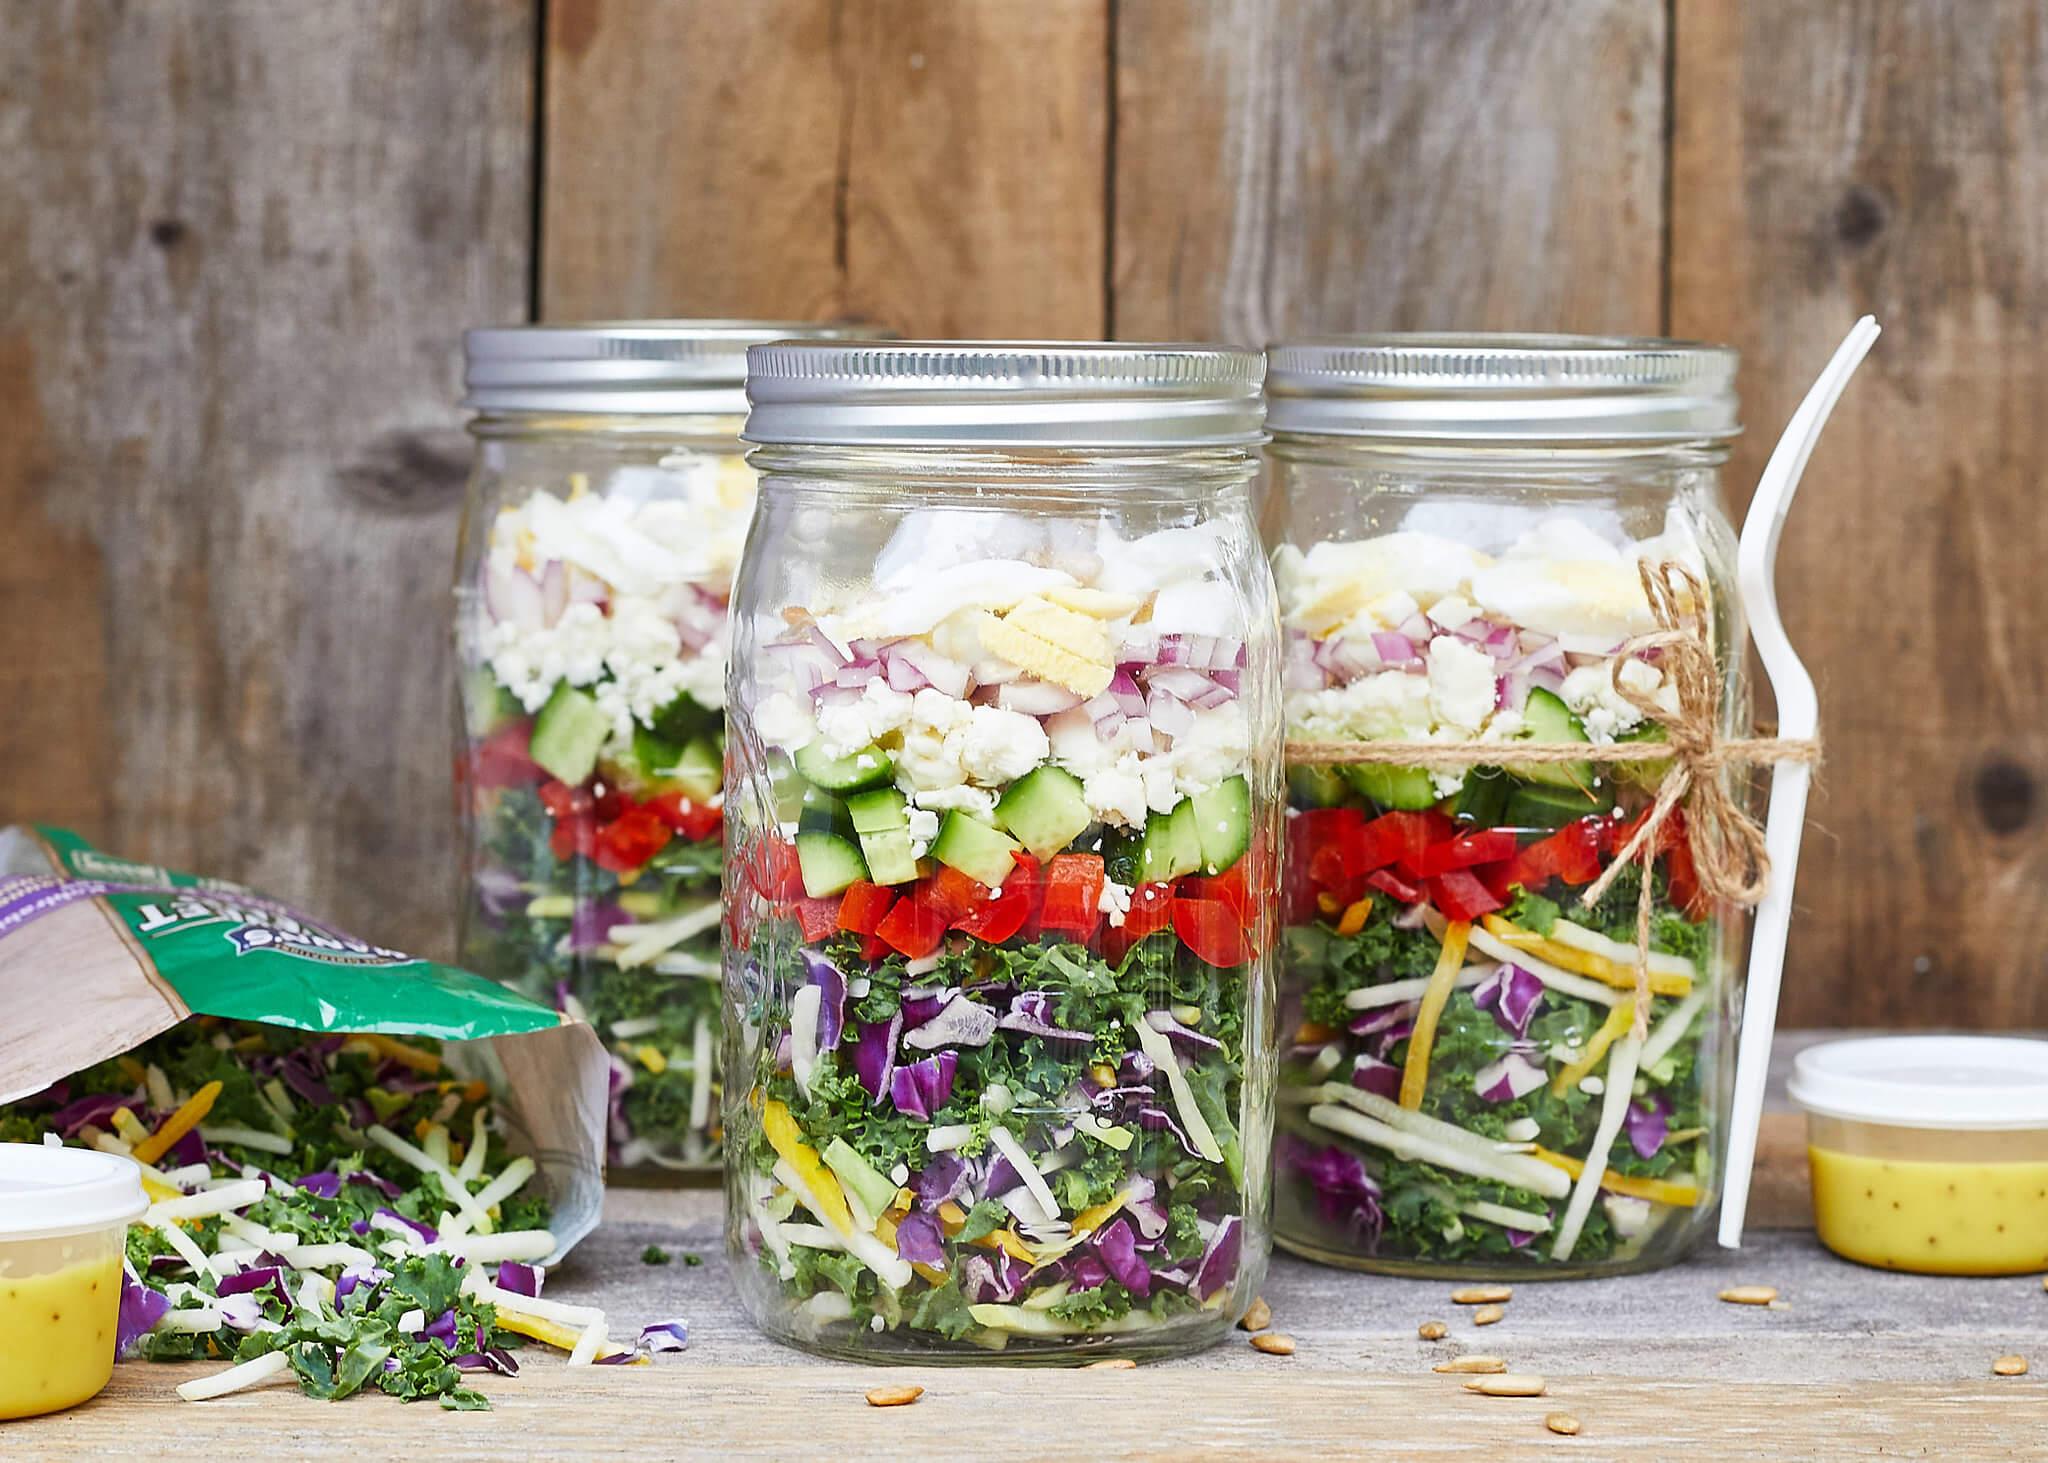 Kale Beet Mediterranean Salad   Quick and Easy Picnic Recipe